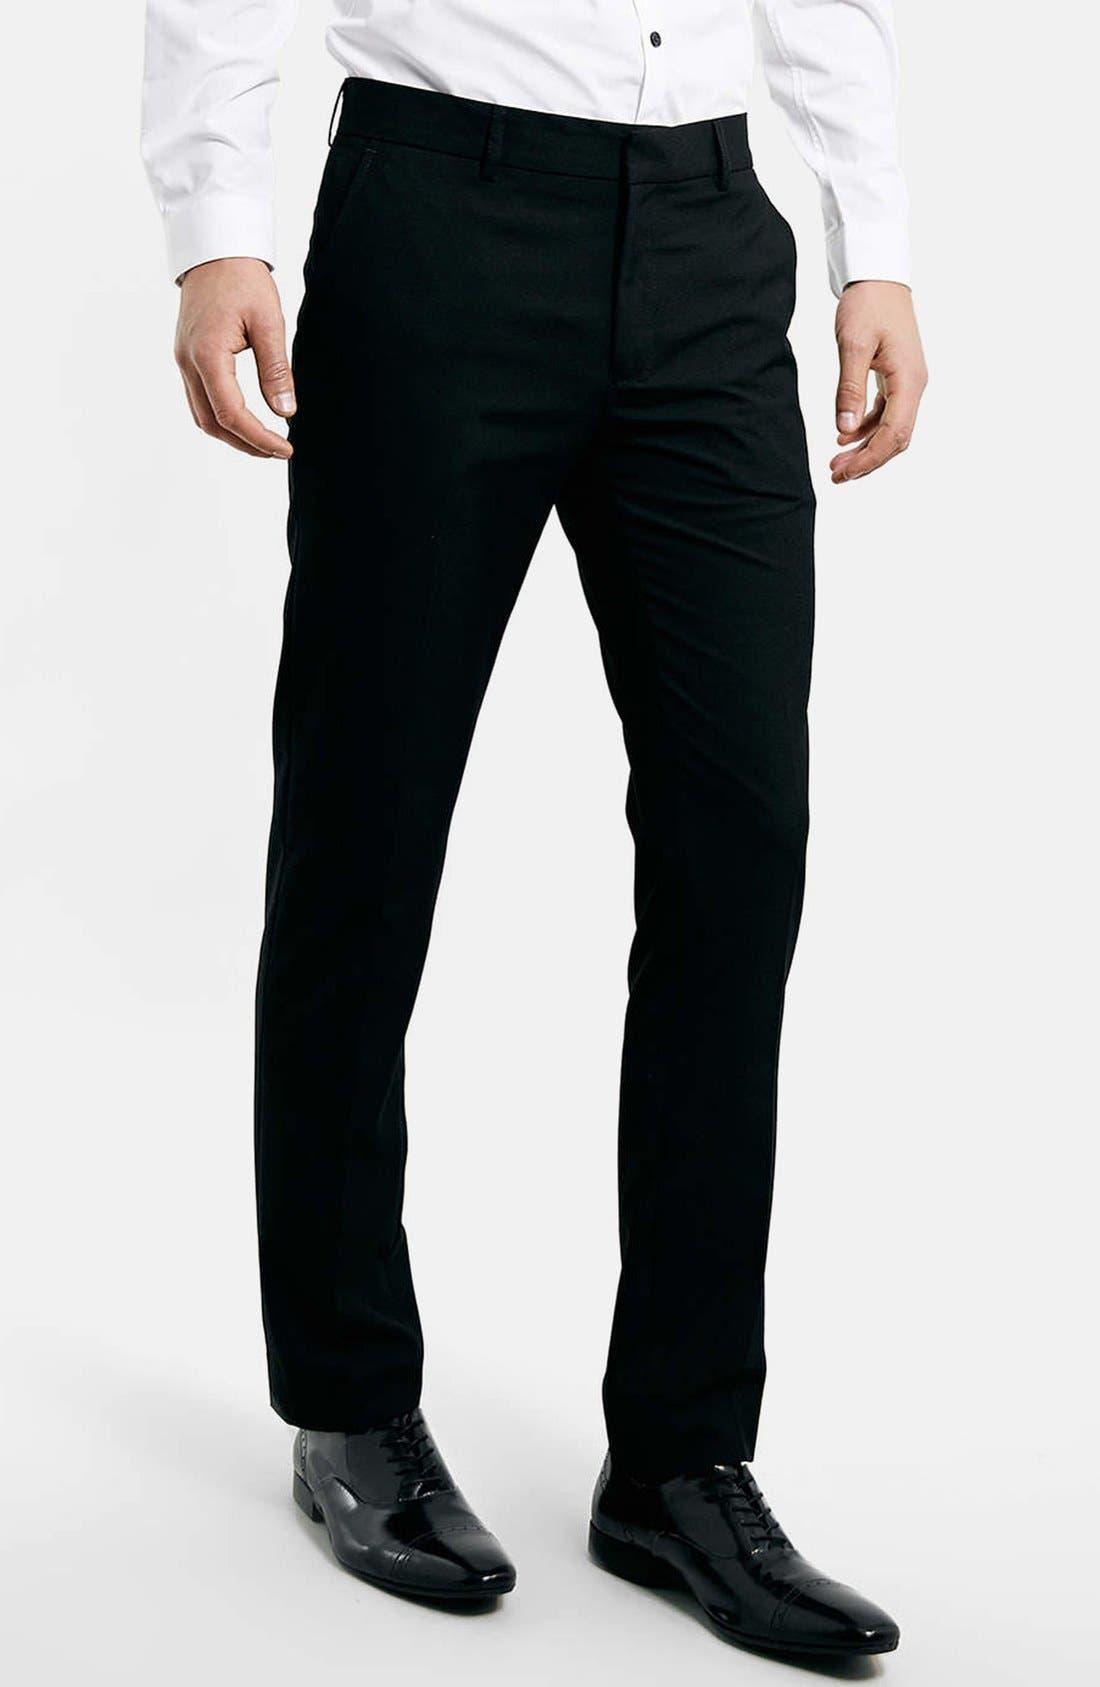 Topman Black Skinny Fit Trousers